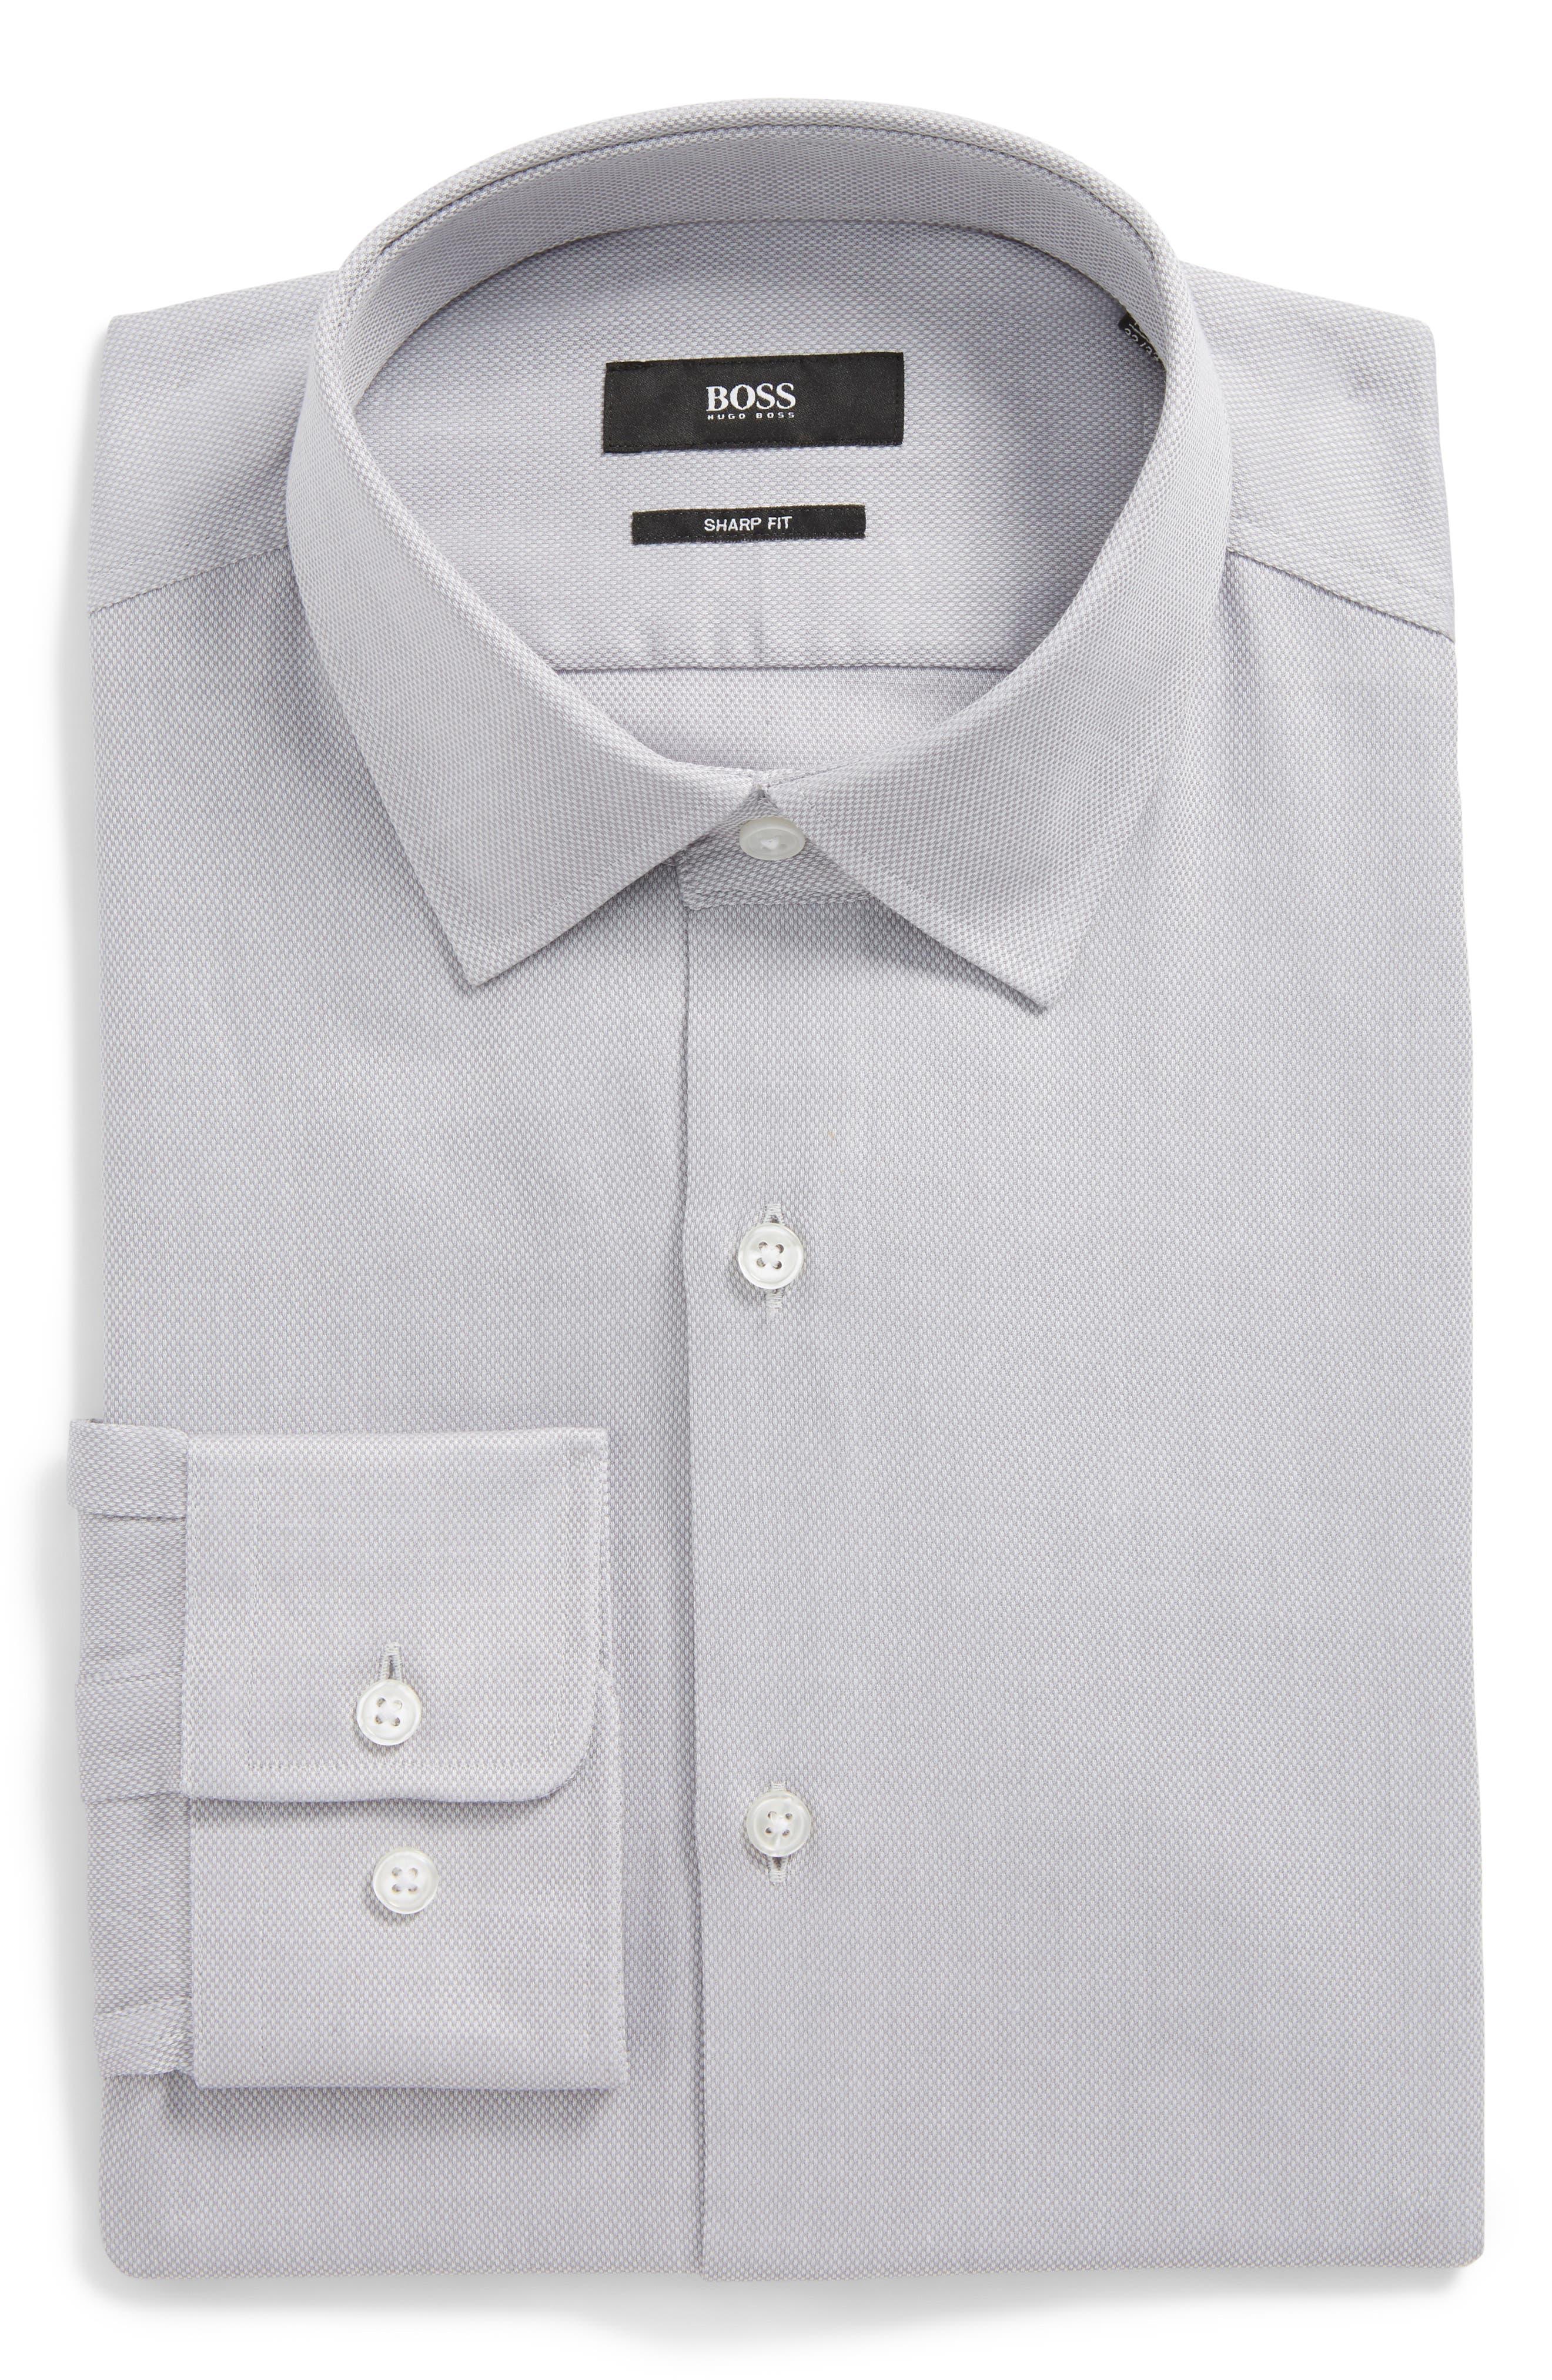 Marley Sharp Fit Dress Shirt,                         Main,                         color, 030